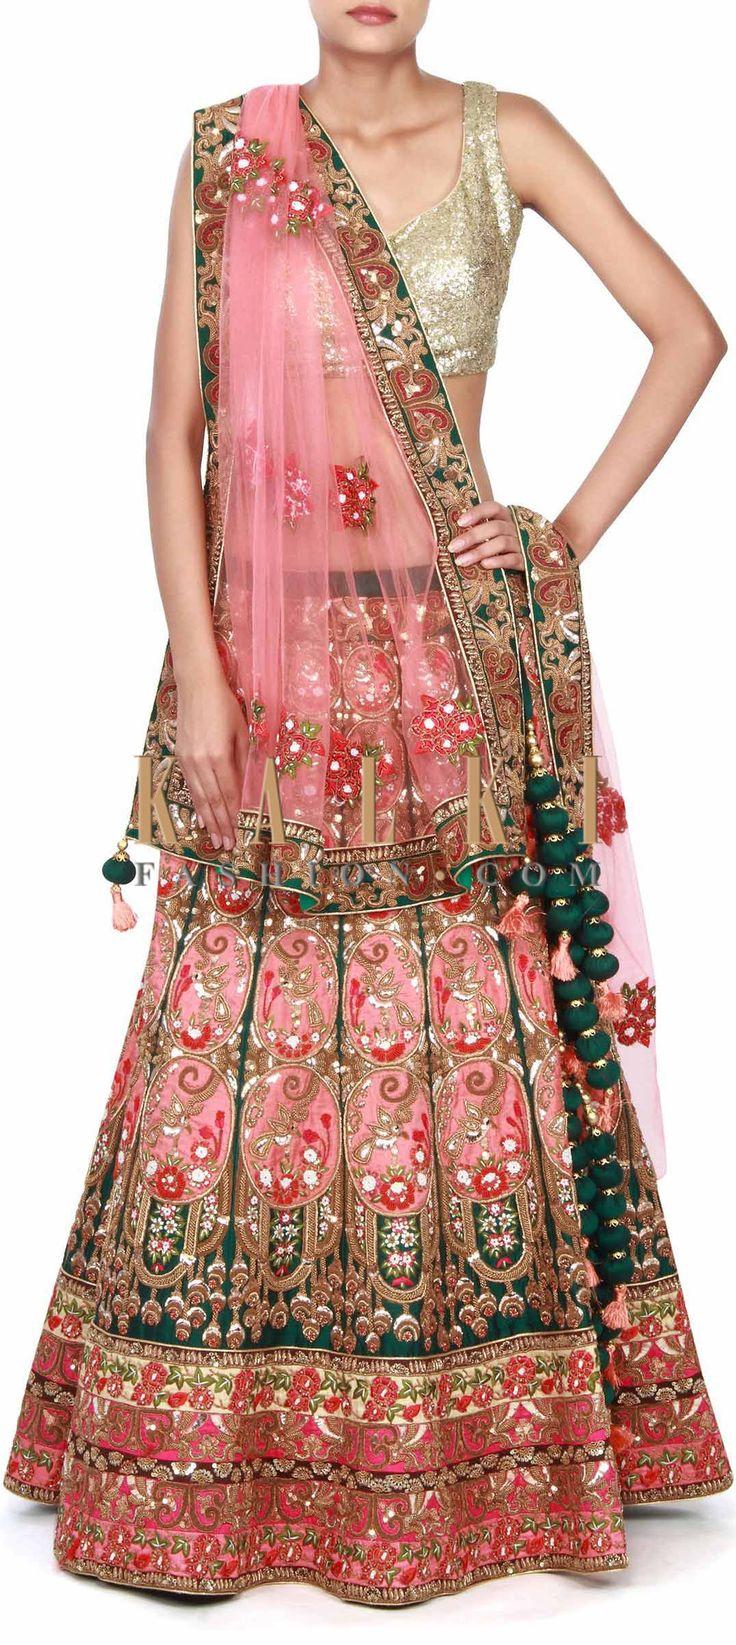 Buy this Pink lehenga adorn in resham and zardosi embroidery only on Kalki